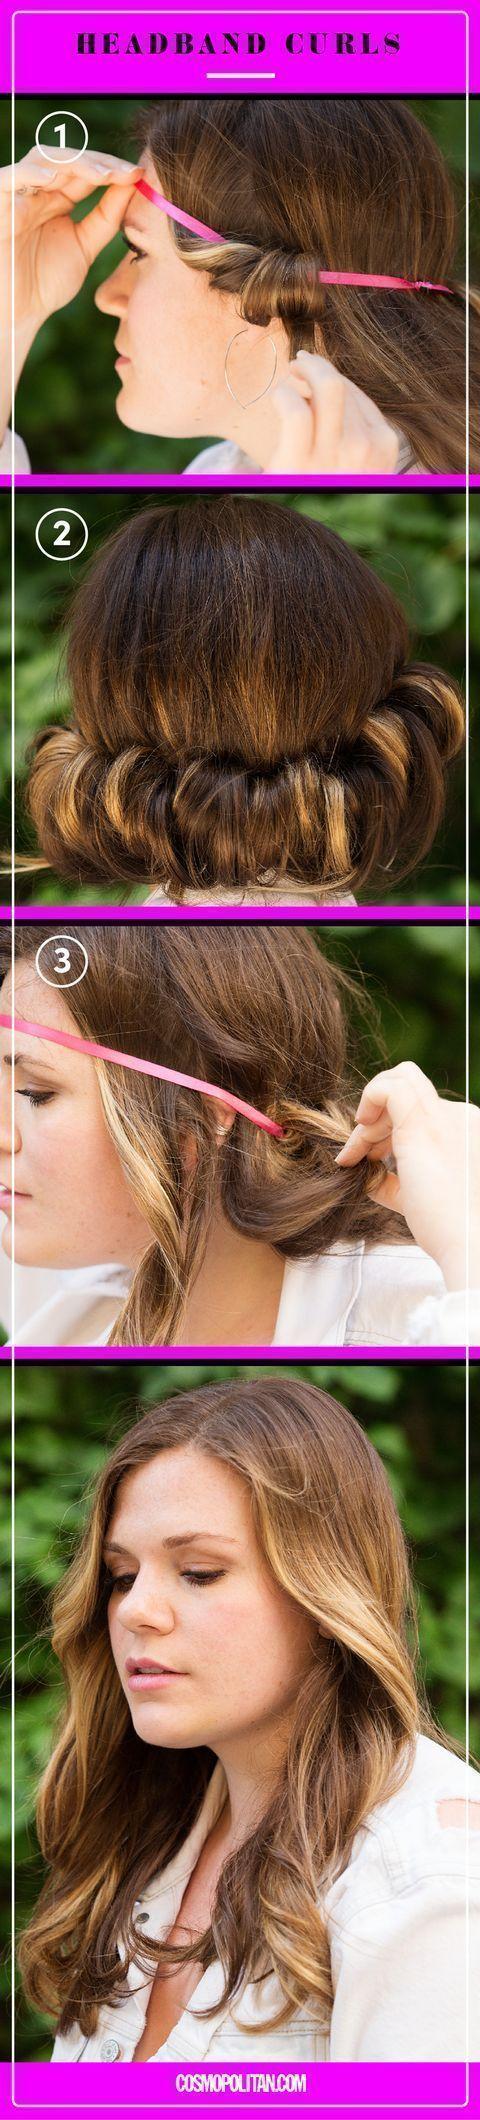 9 Easy No Heat Ways To Style Wet Hair Noheathair 9 Easy No Heat Ways To Style Wet Hair Easy Hair Hairstyle Haar Styling Nasse Haare Locken Fur Lange Haare